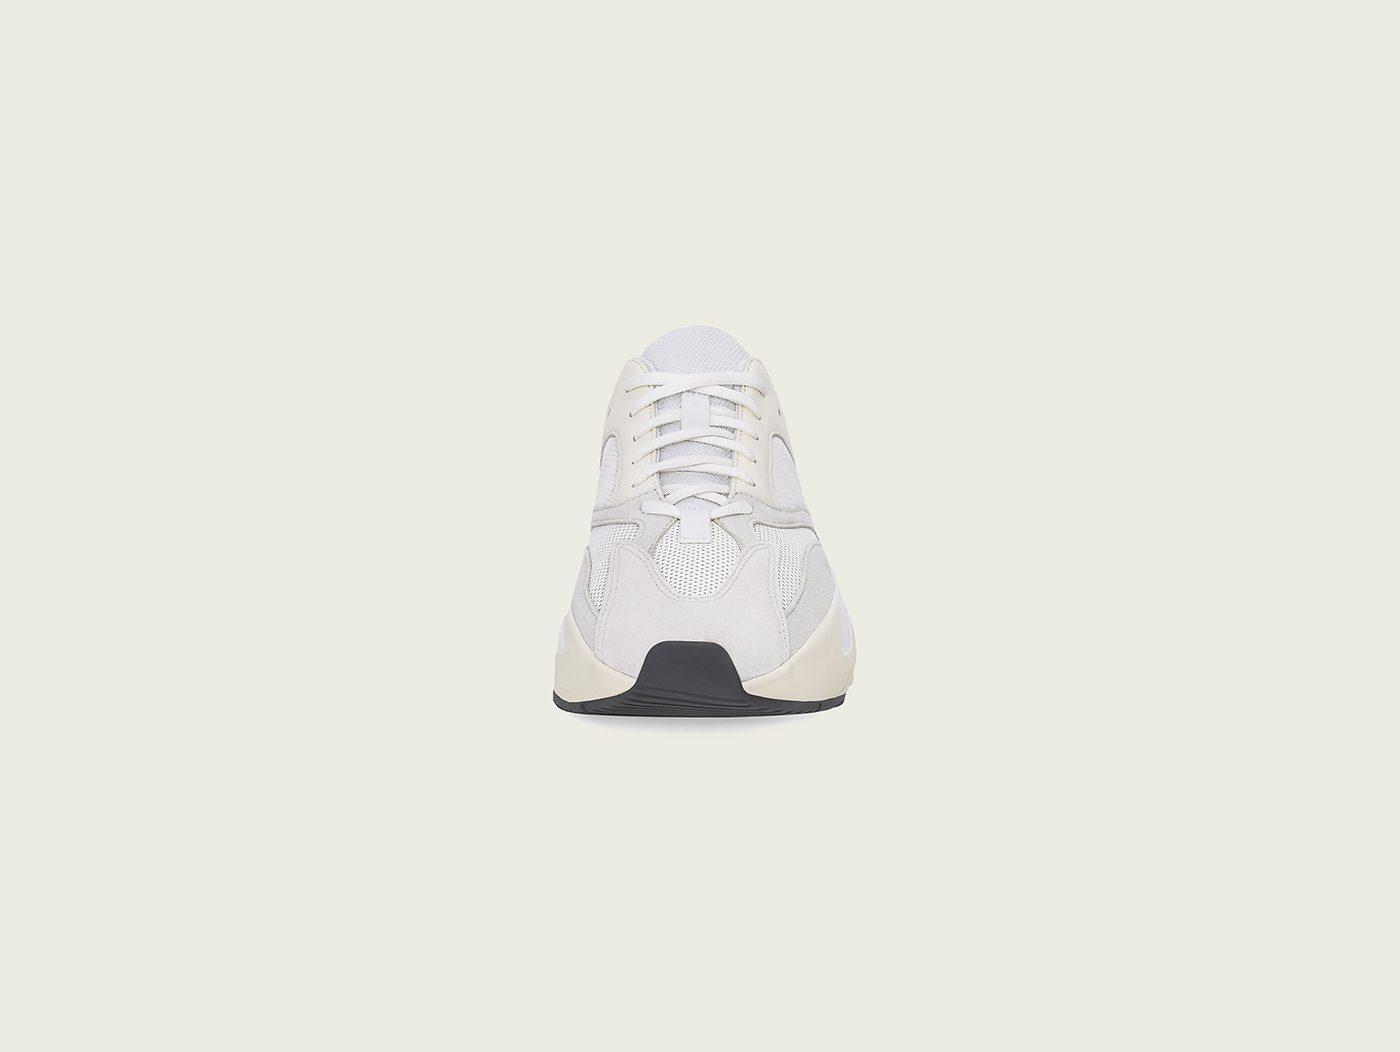 adidas Originals YEEZY BOOST 700 Analog